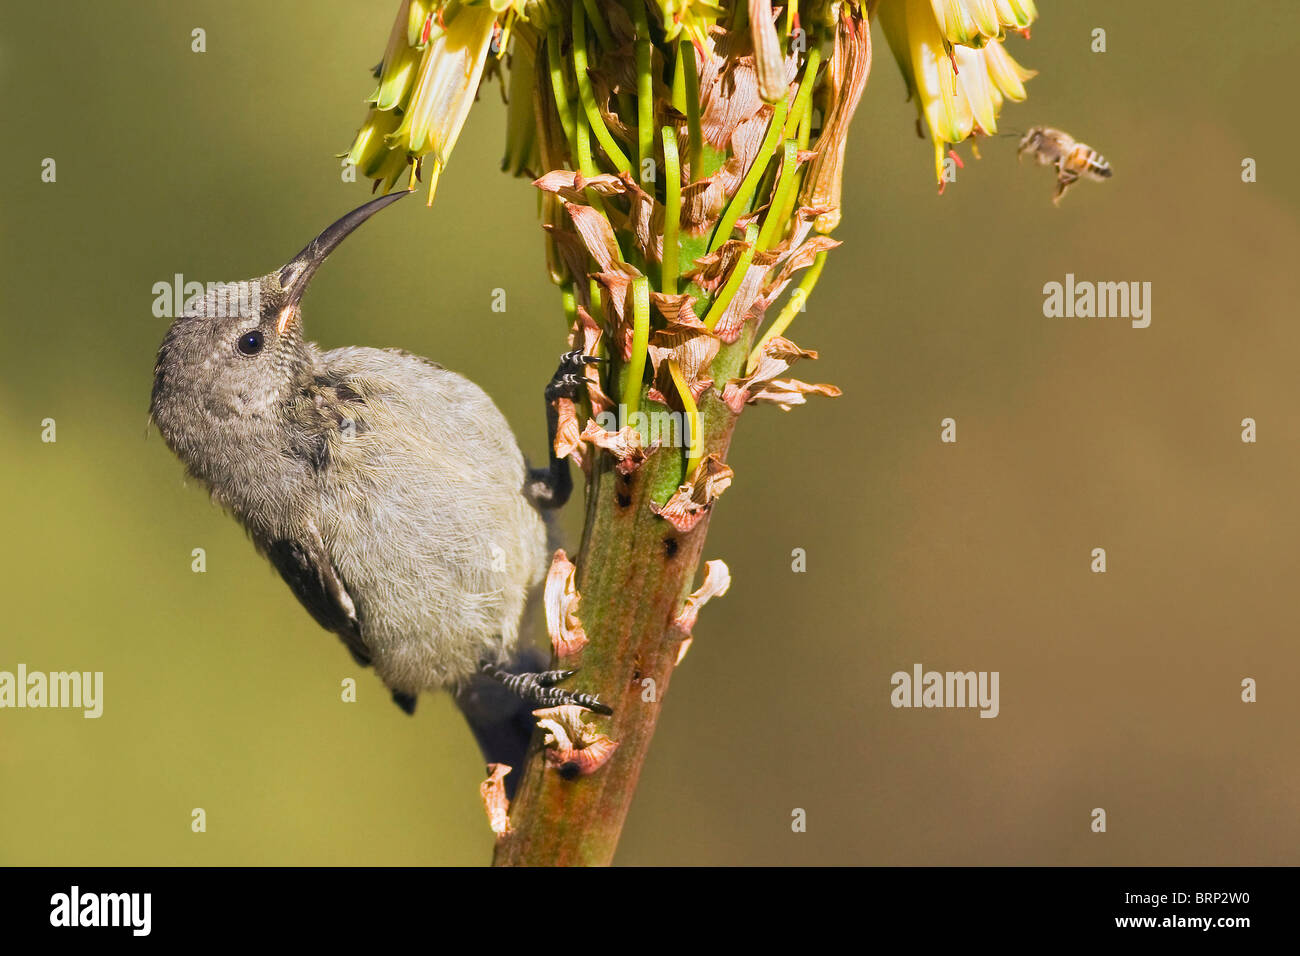 Greater Double-collared Sunbird feeding on nectar - Stock Image